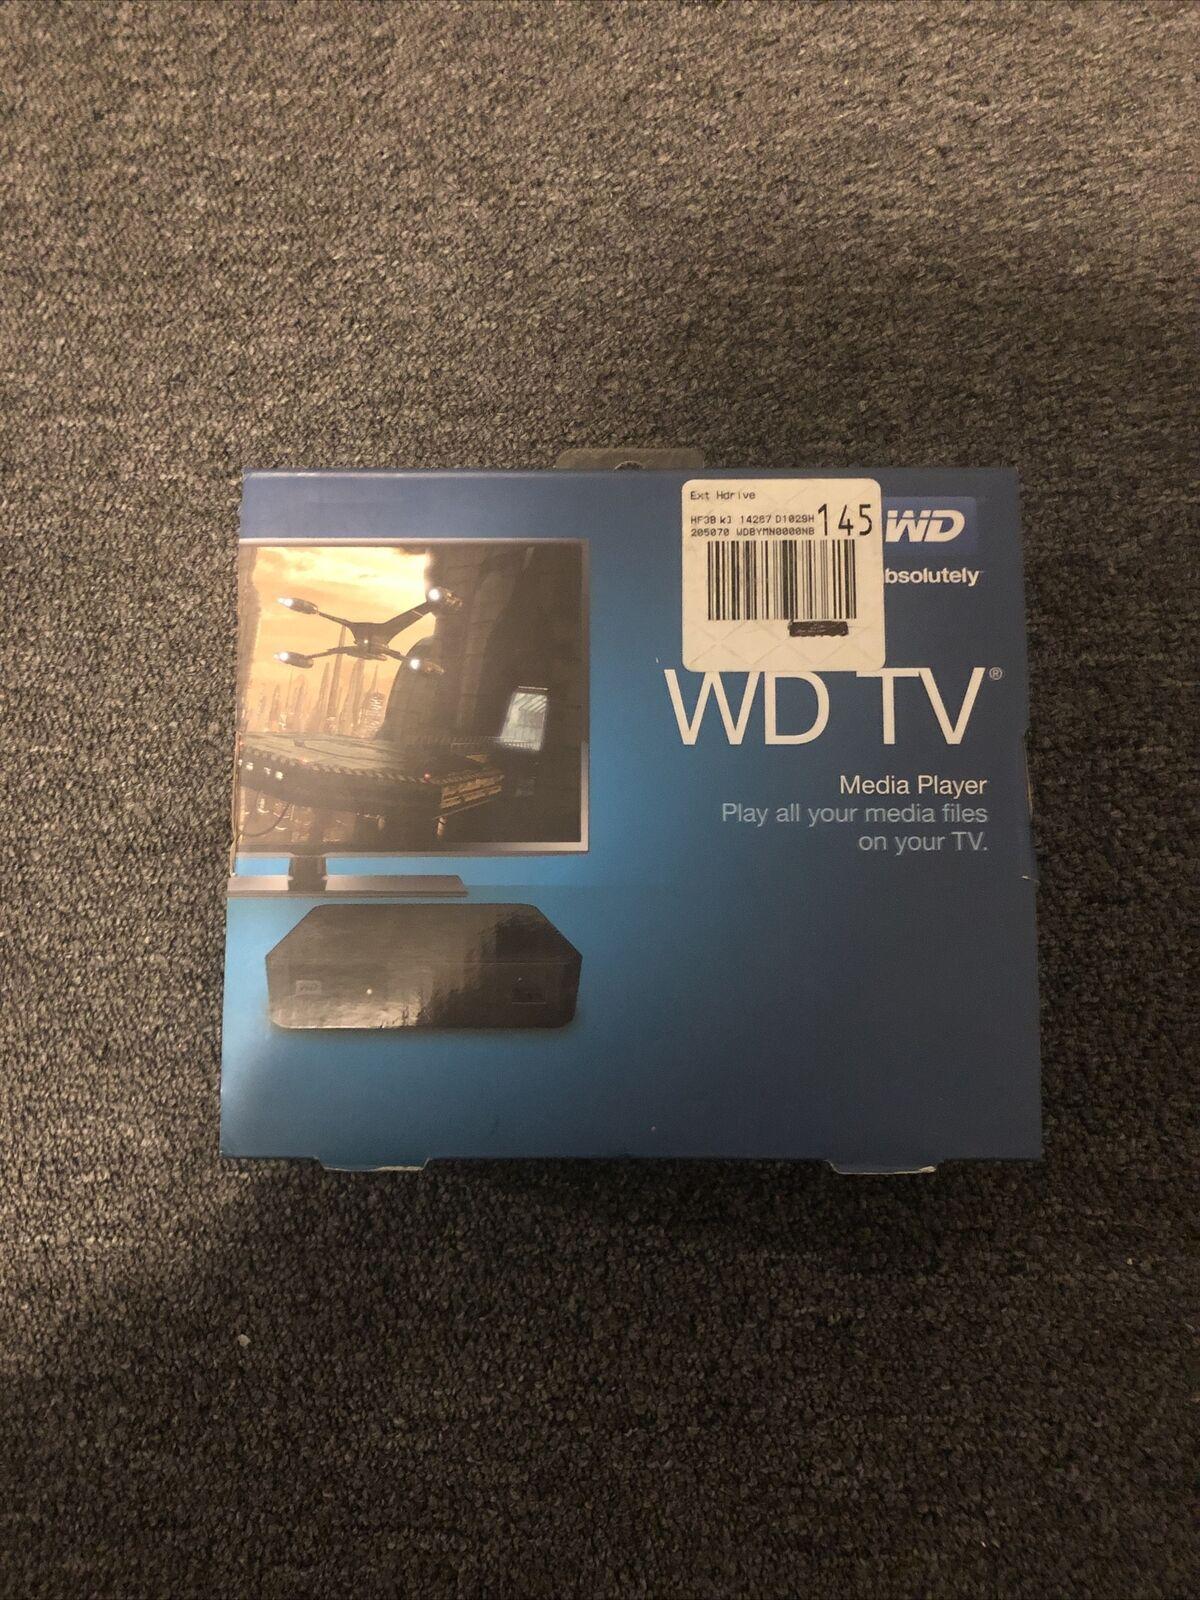 NEW Western Digital WD TV Streaming Media Player WDBYMN0000NBK digital media new player streaming wdbymn0000nbk western